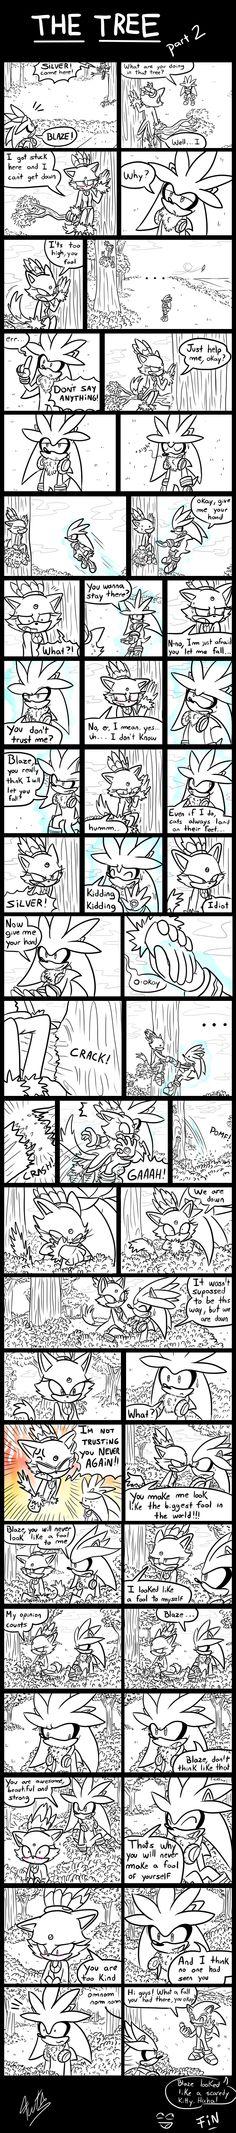 The Tree [Part 2] - (A Silver and Blaze Comic) by Fuutachimaru.deviantart.com on @deviantART